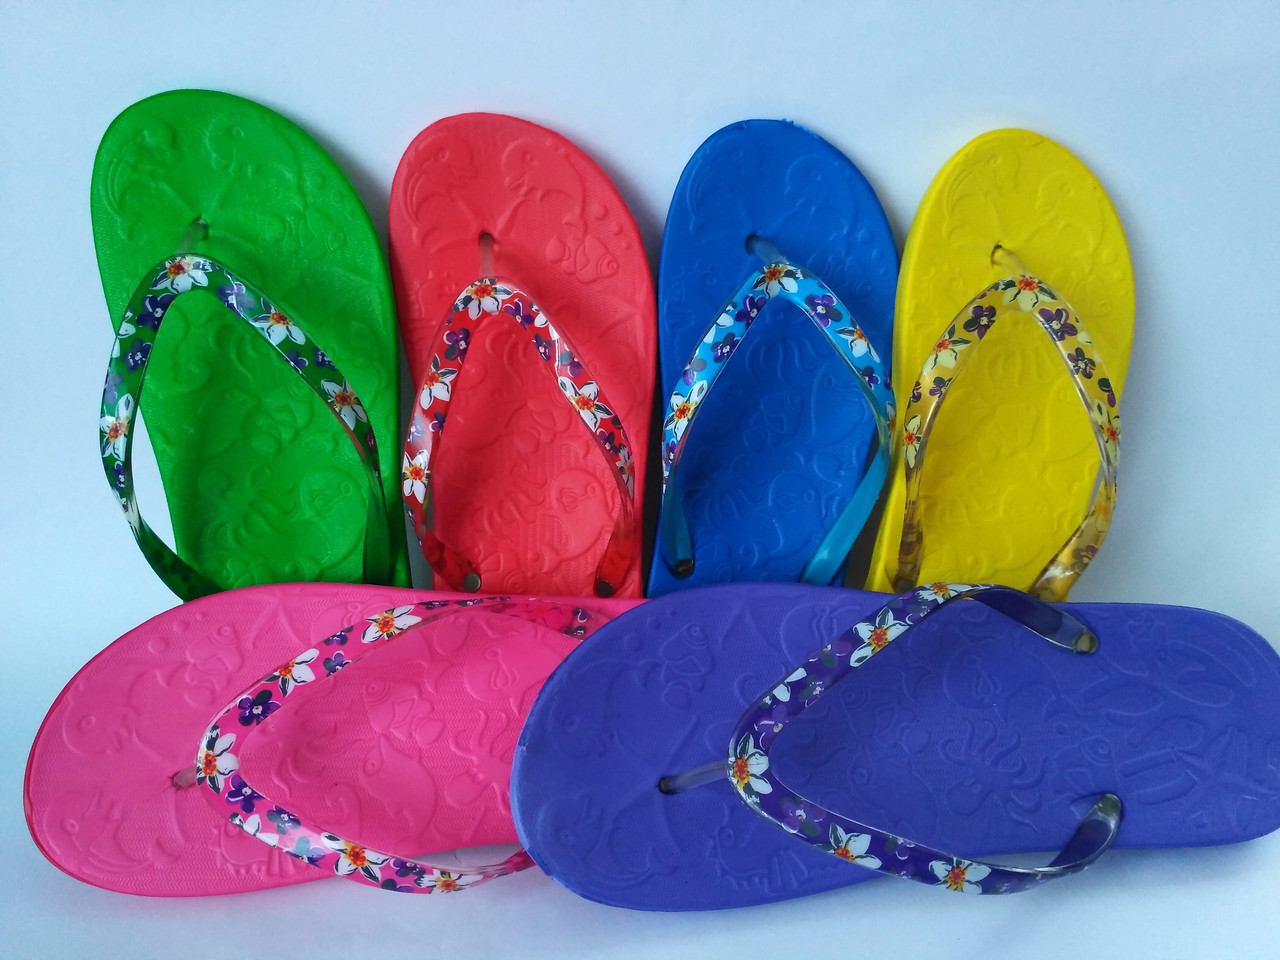 557d4a991 Яркие вьетнамки (сланцы) для девочки ( р. 30-35): продажа, цена в ...